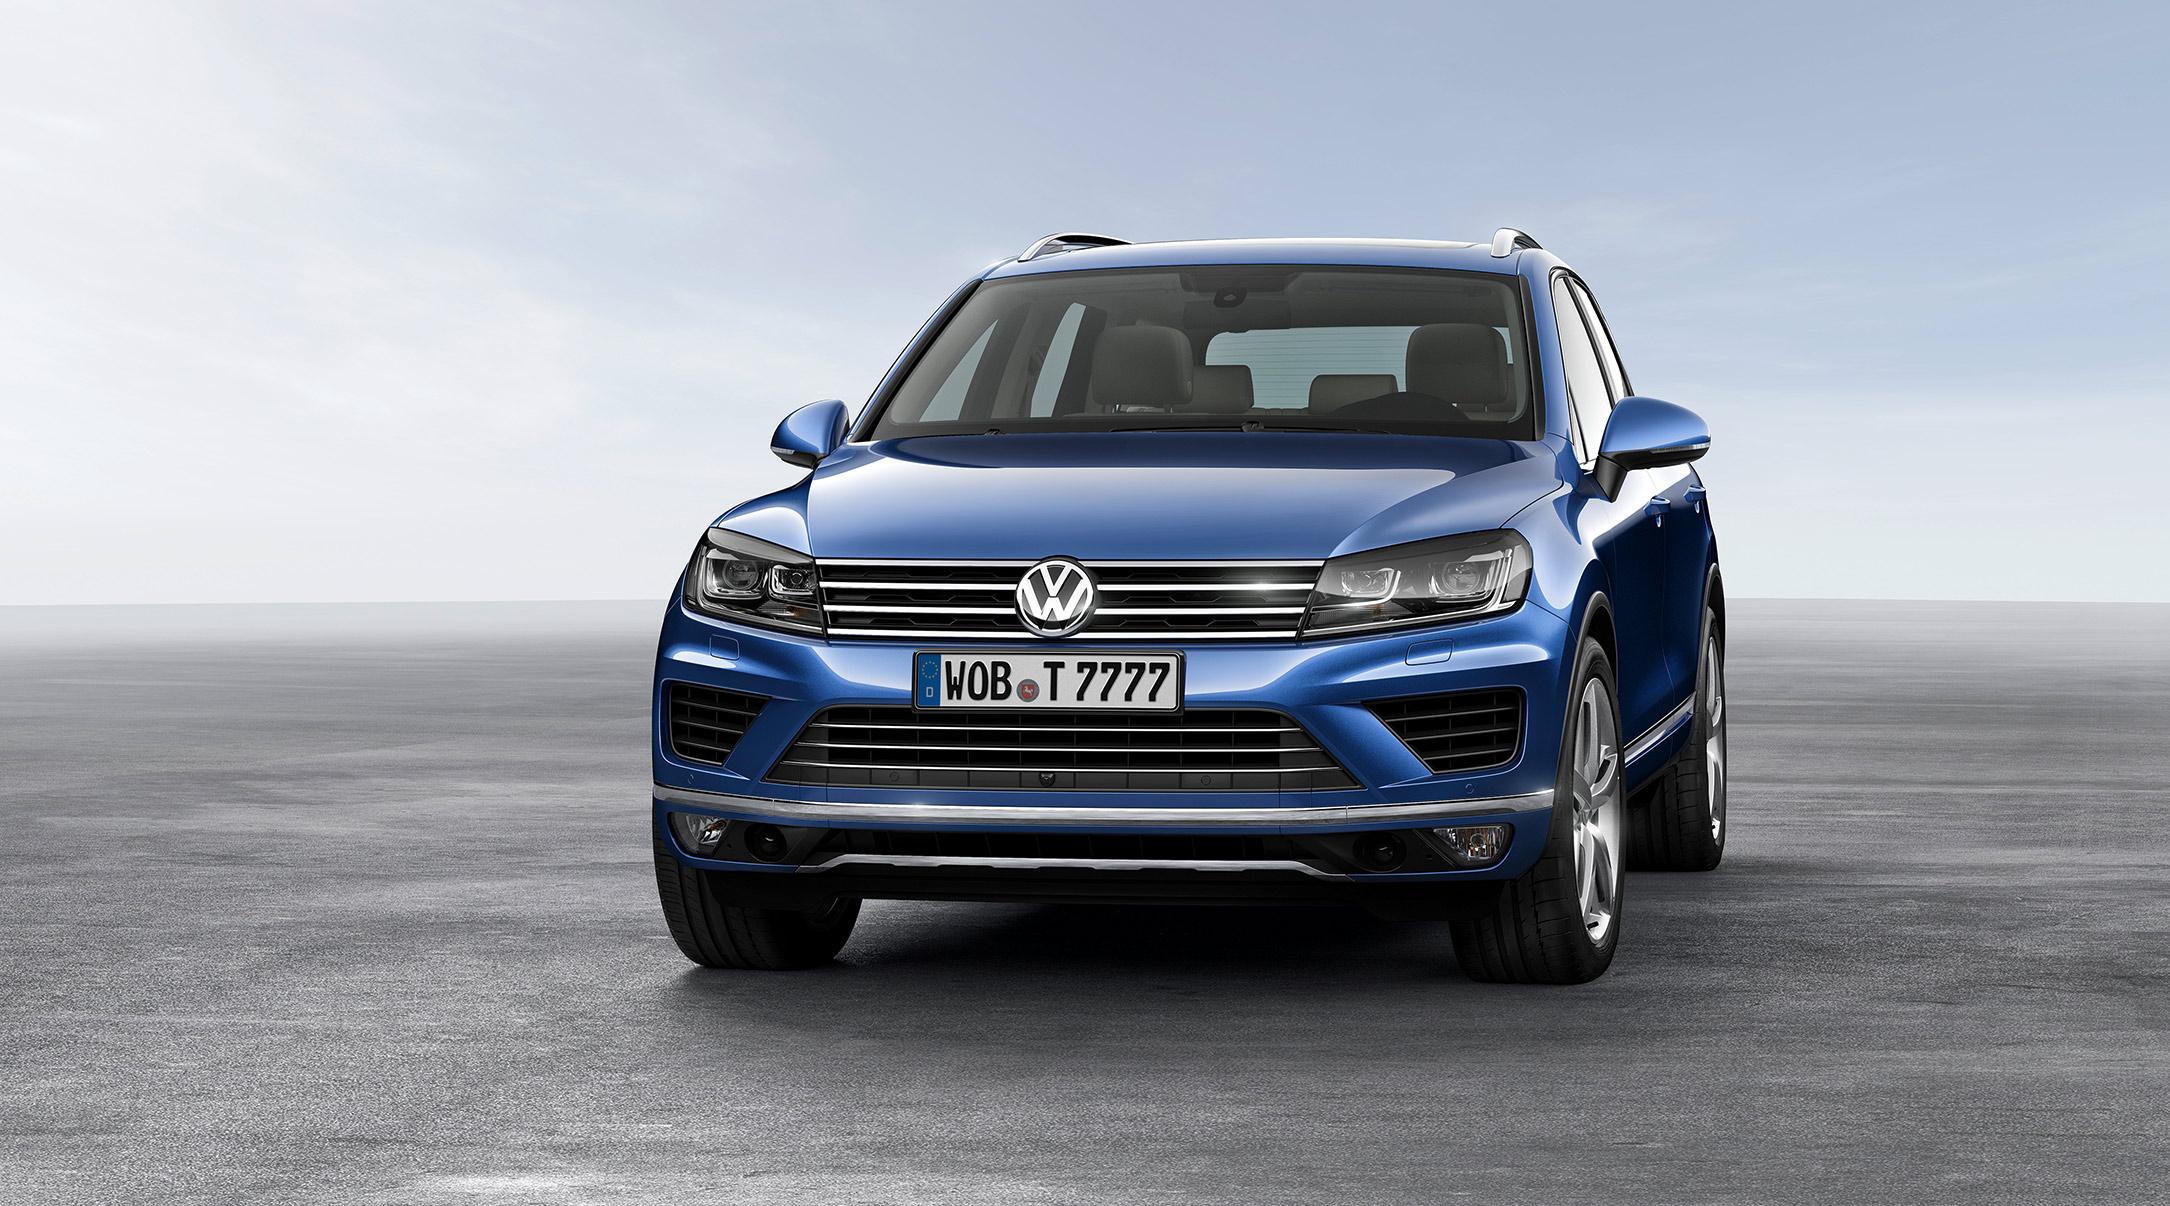 volkswagen-toureg-facelift-6